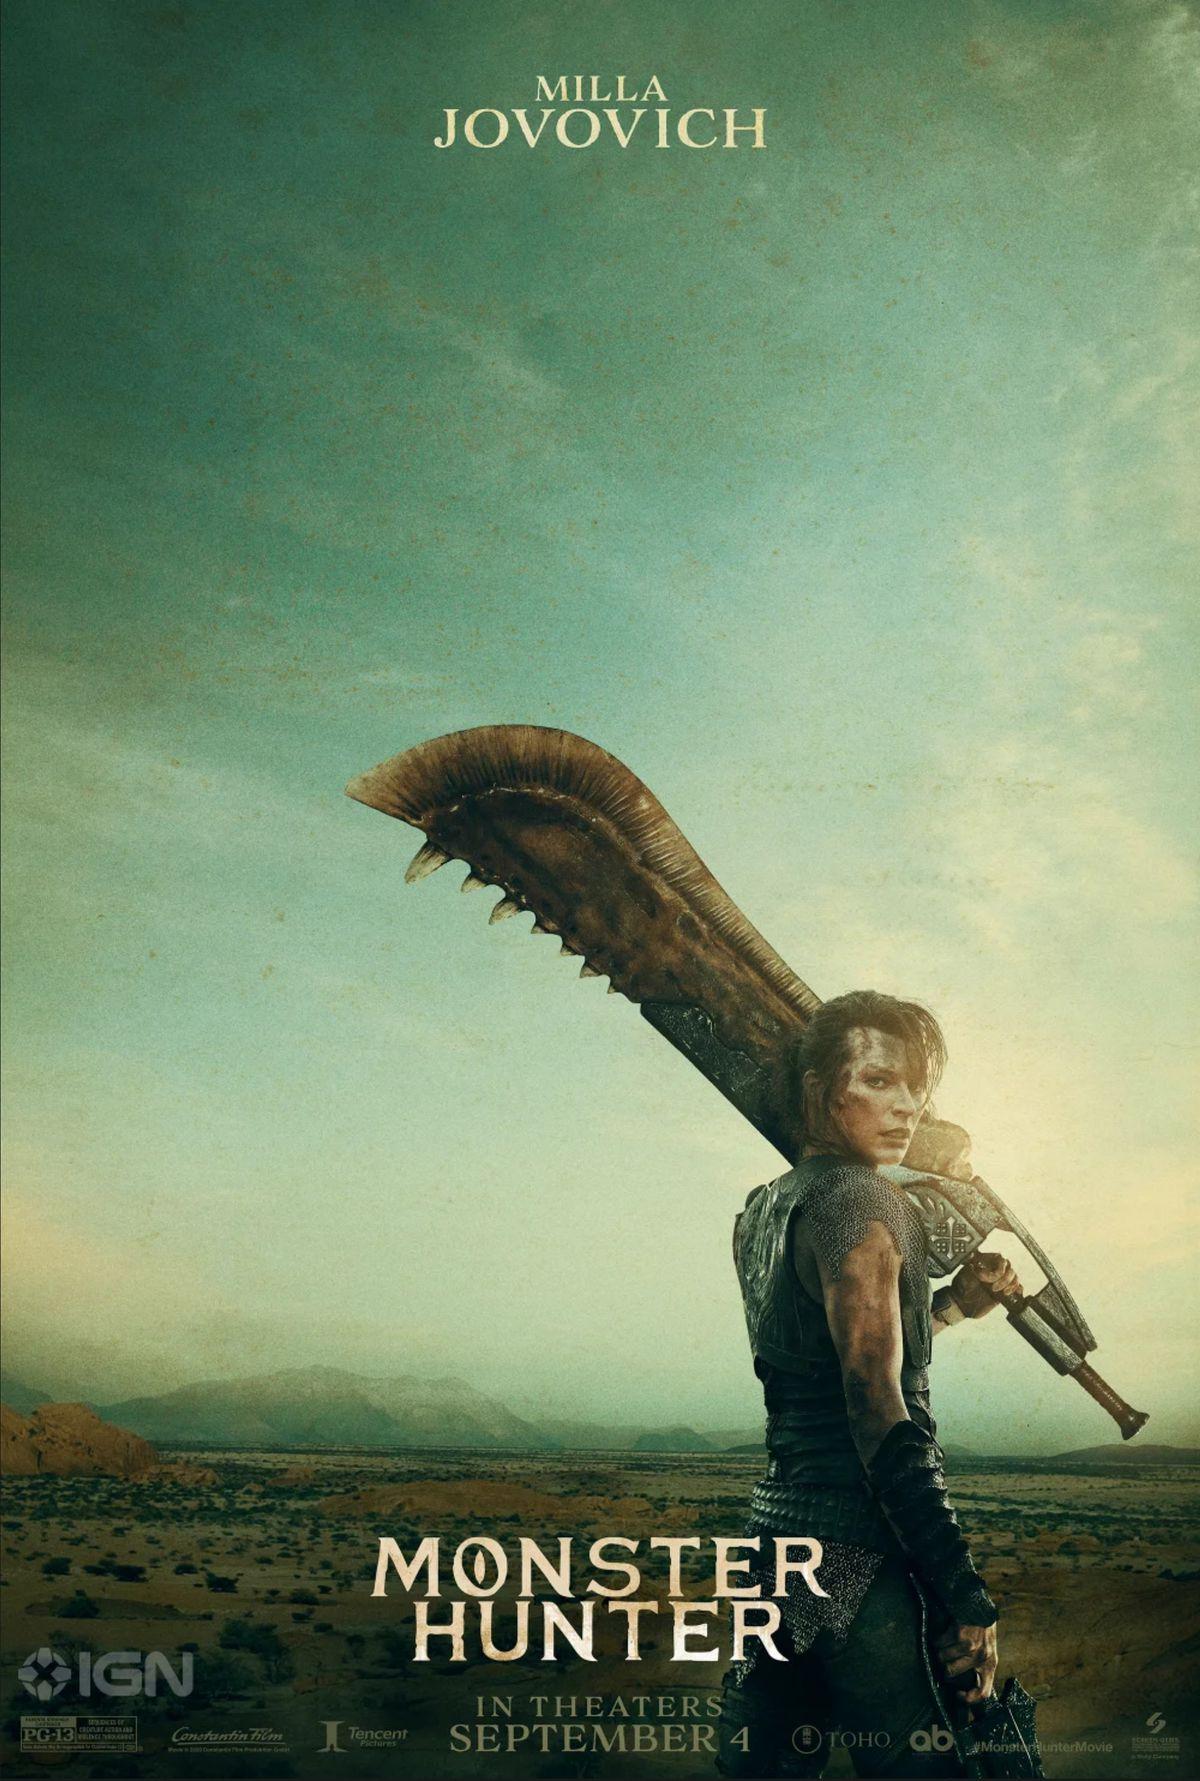 Milla Jovovich holds an oversized sword on a desert plain. The sky is a murky green.